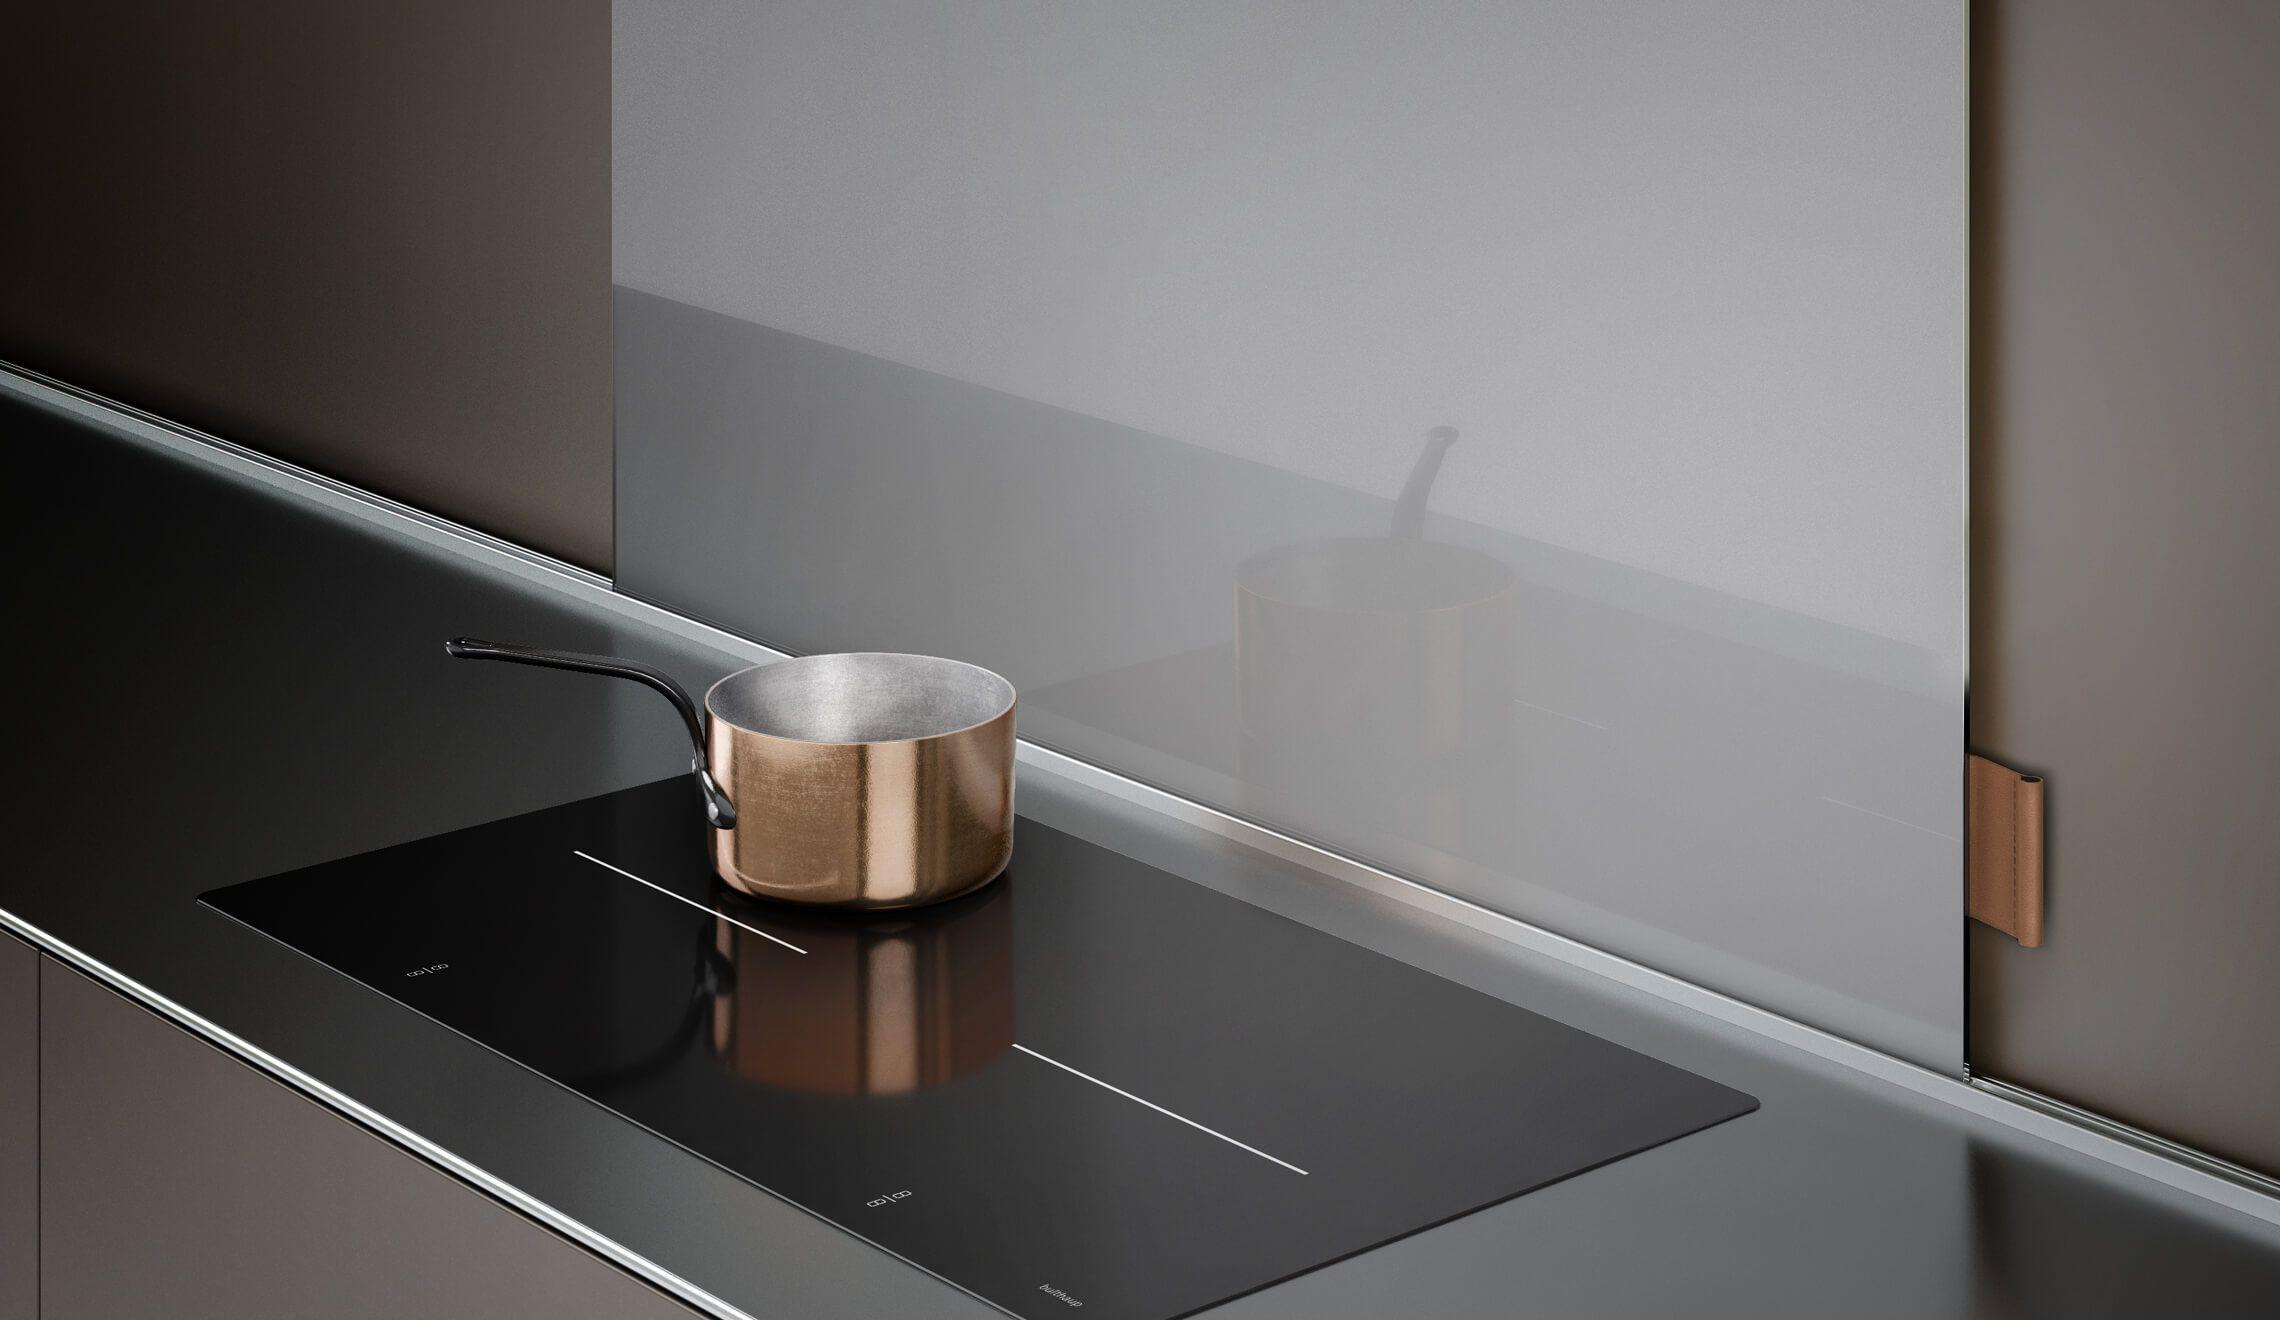 bulthaup - b3 keuken - design - elektrisch fornuis - koperen ...